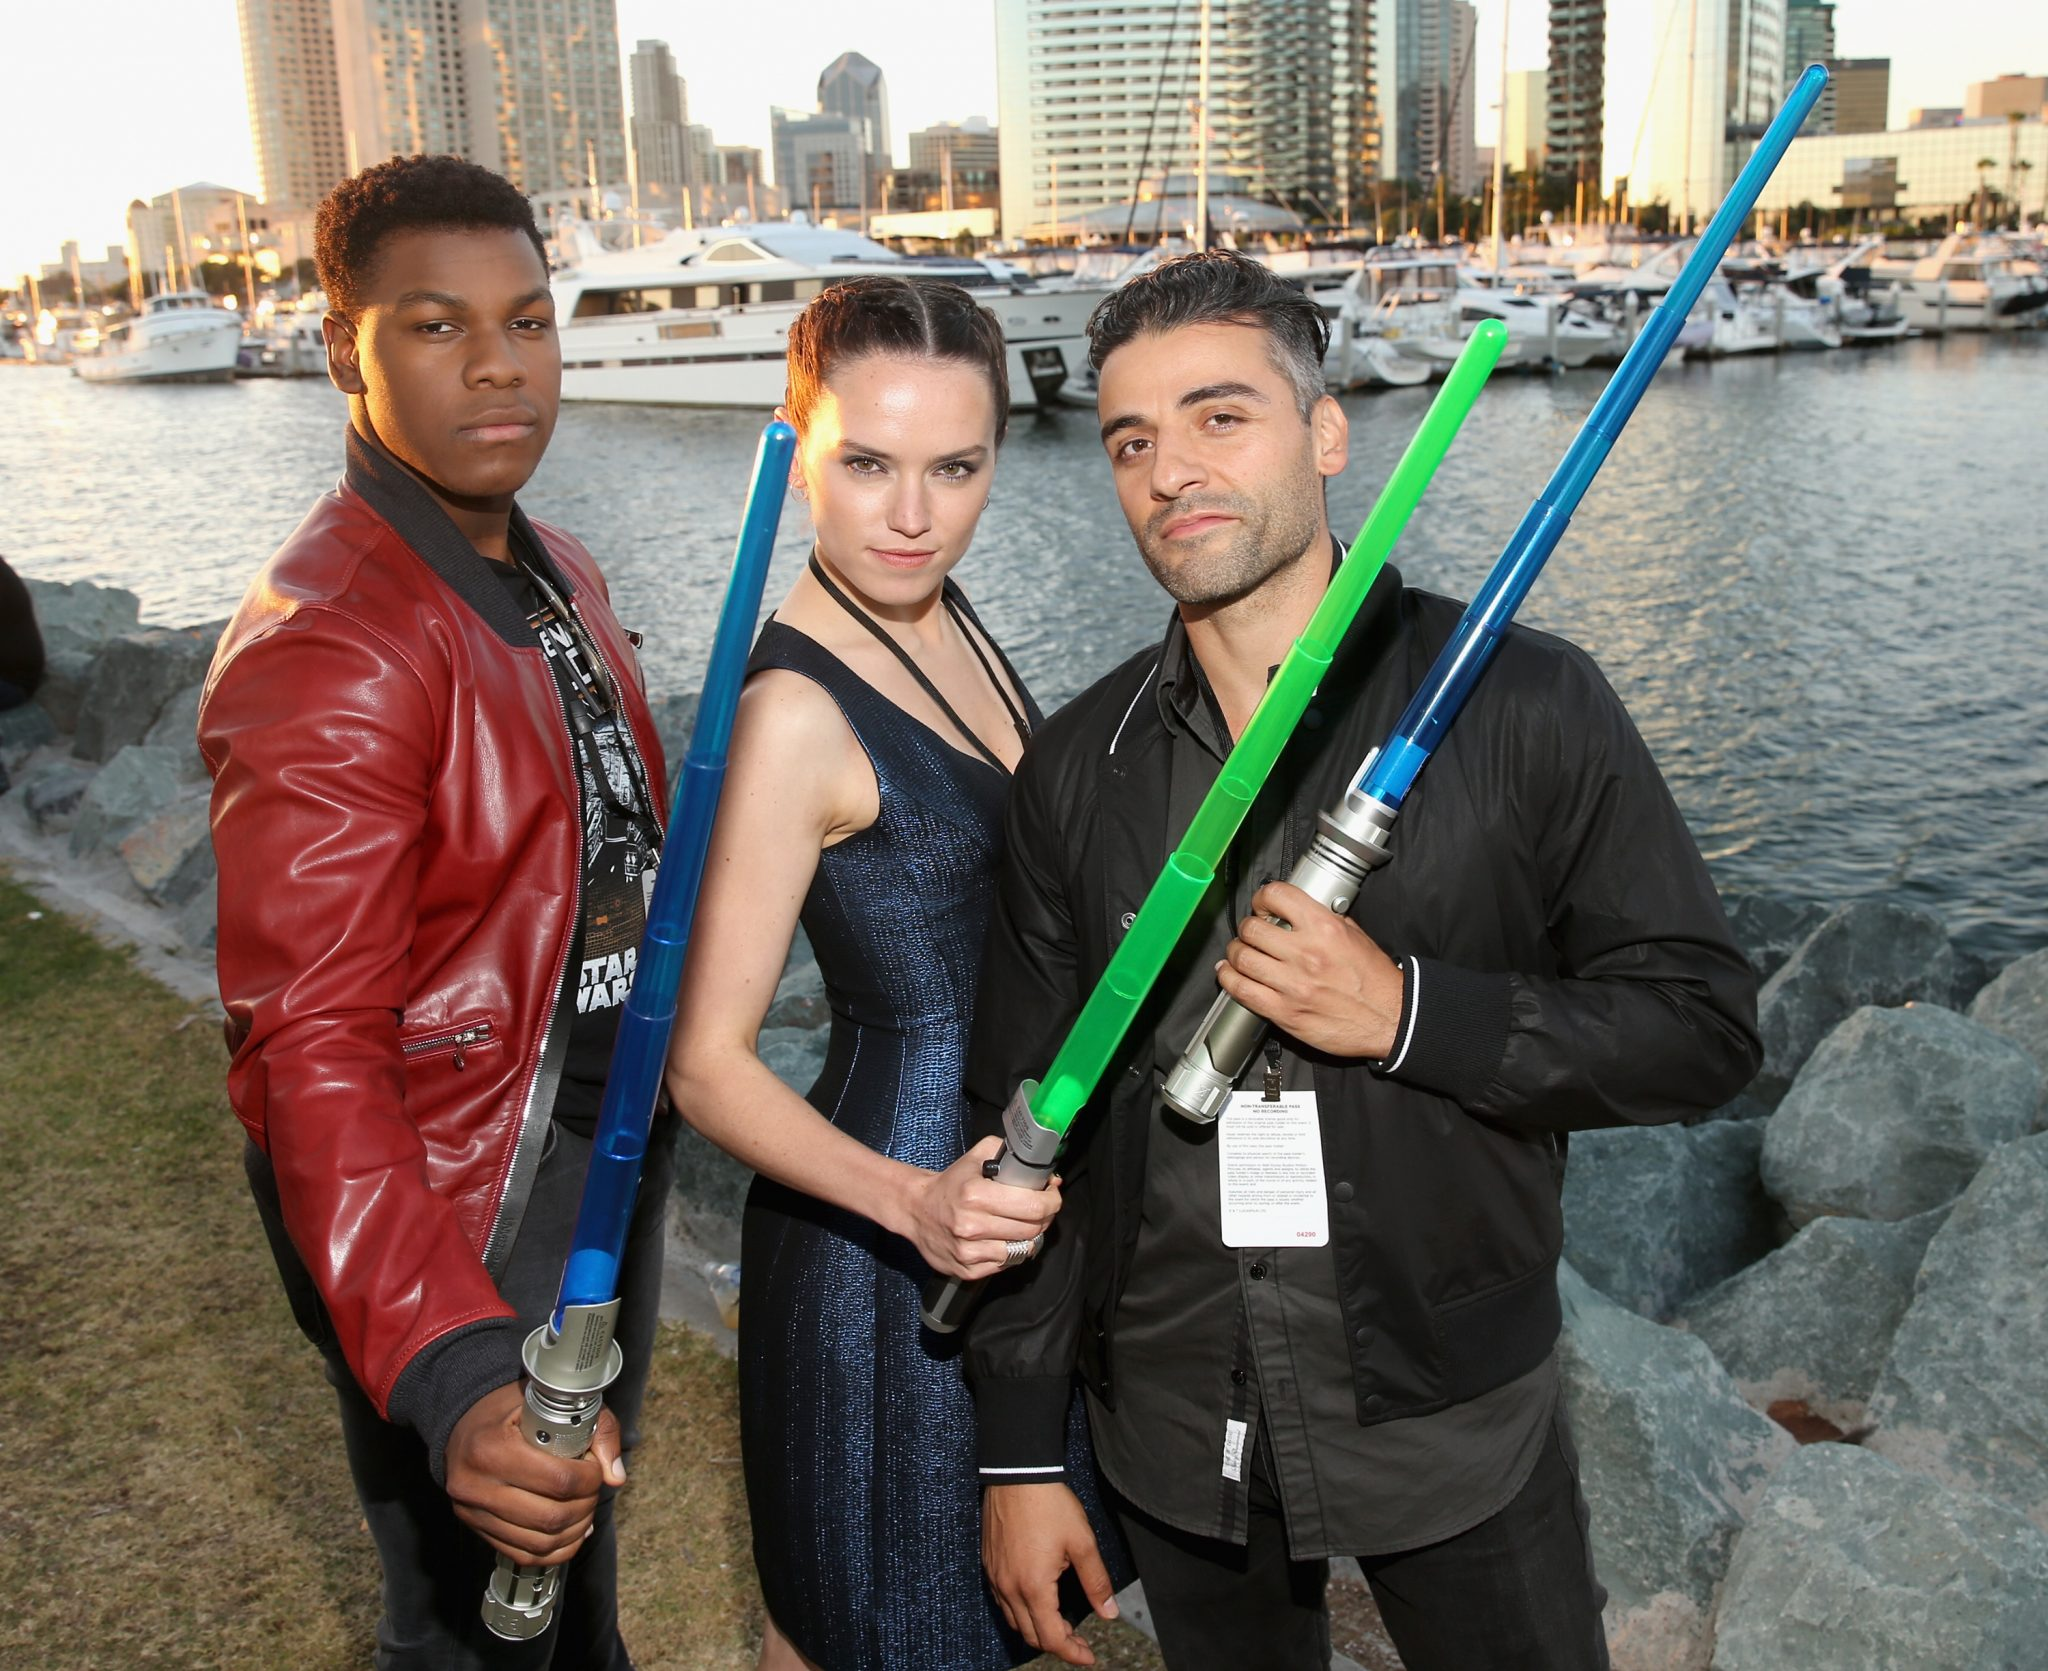 Harrison Ford, John Boyega  & More Attend Comic-Con International 2015